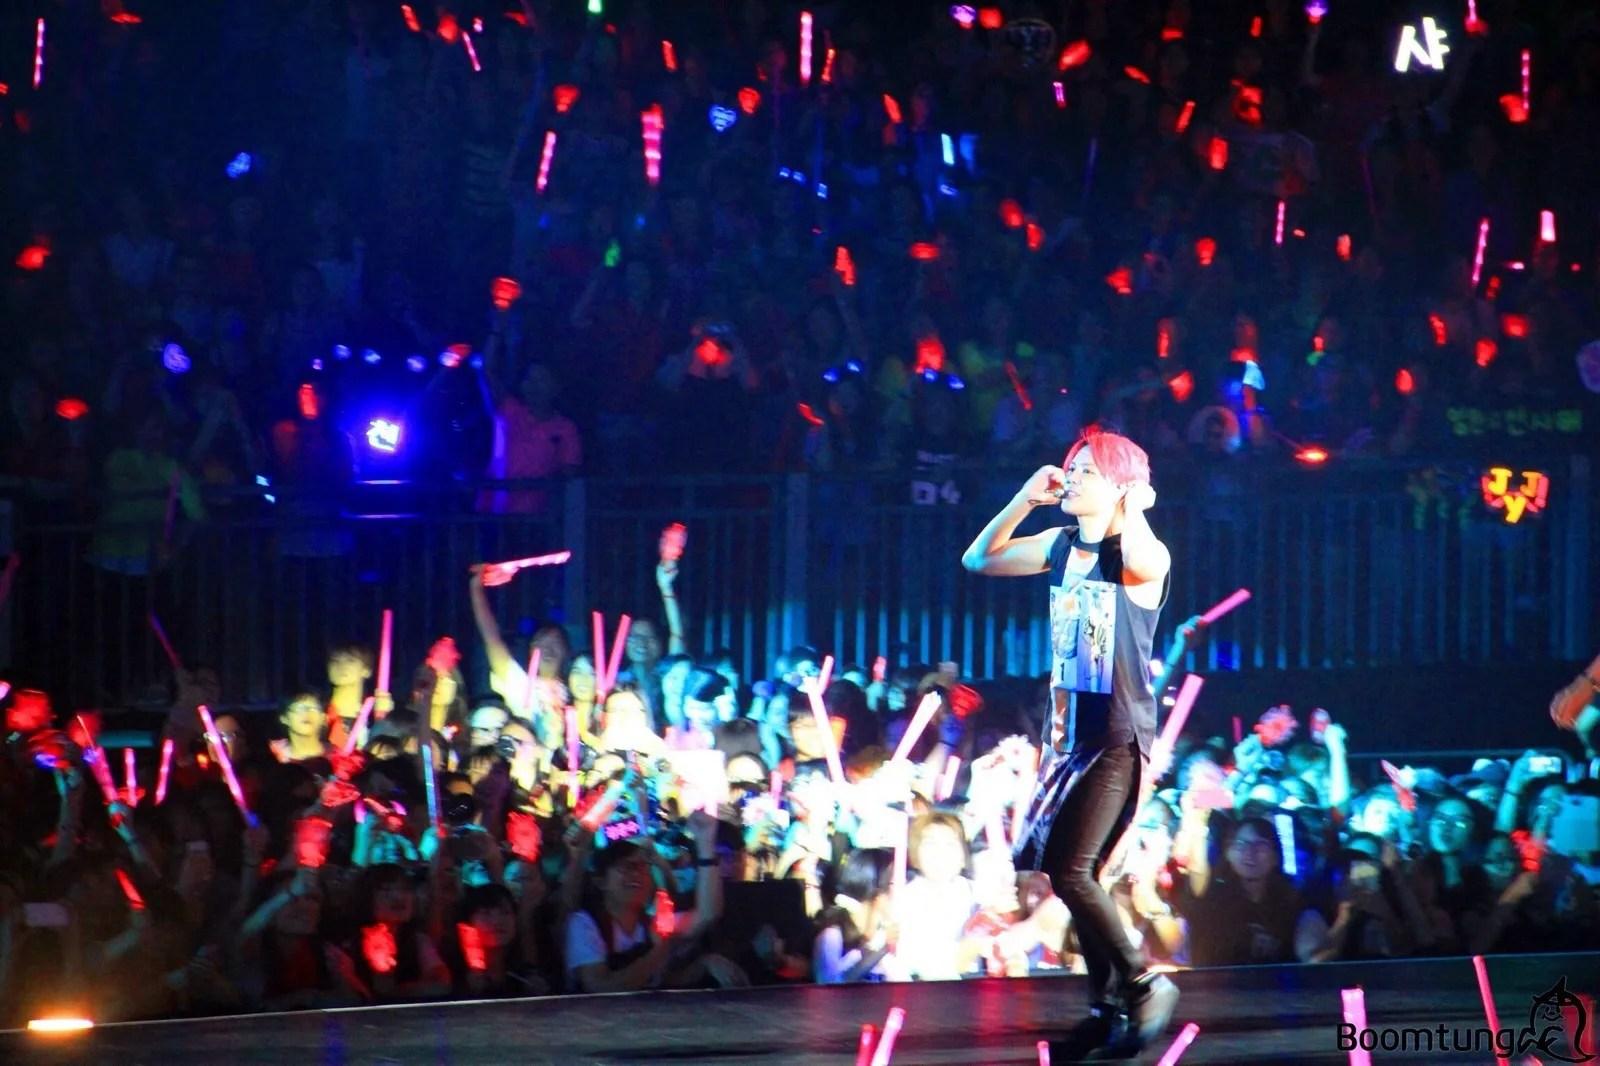 photo BoomTung_20.jpg